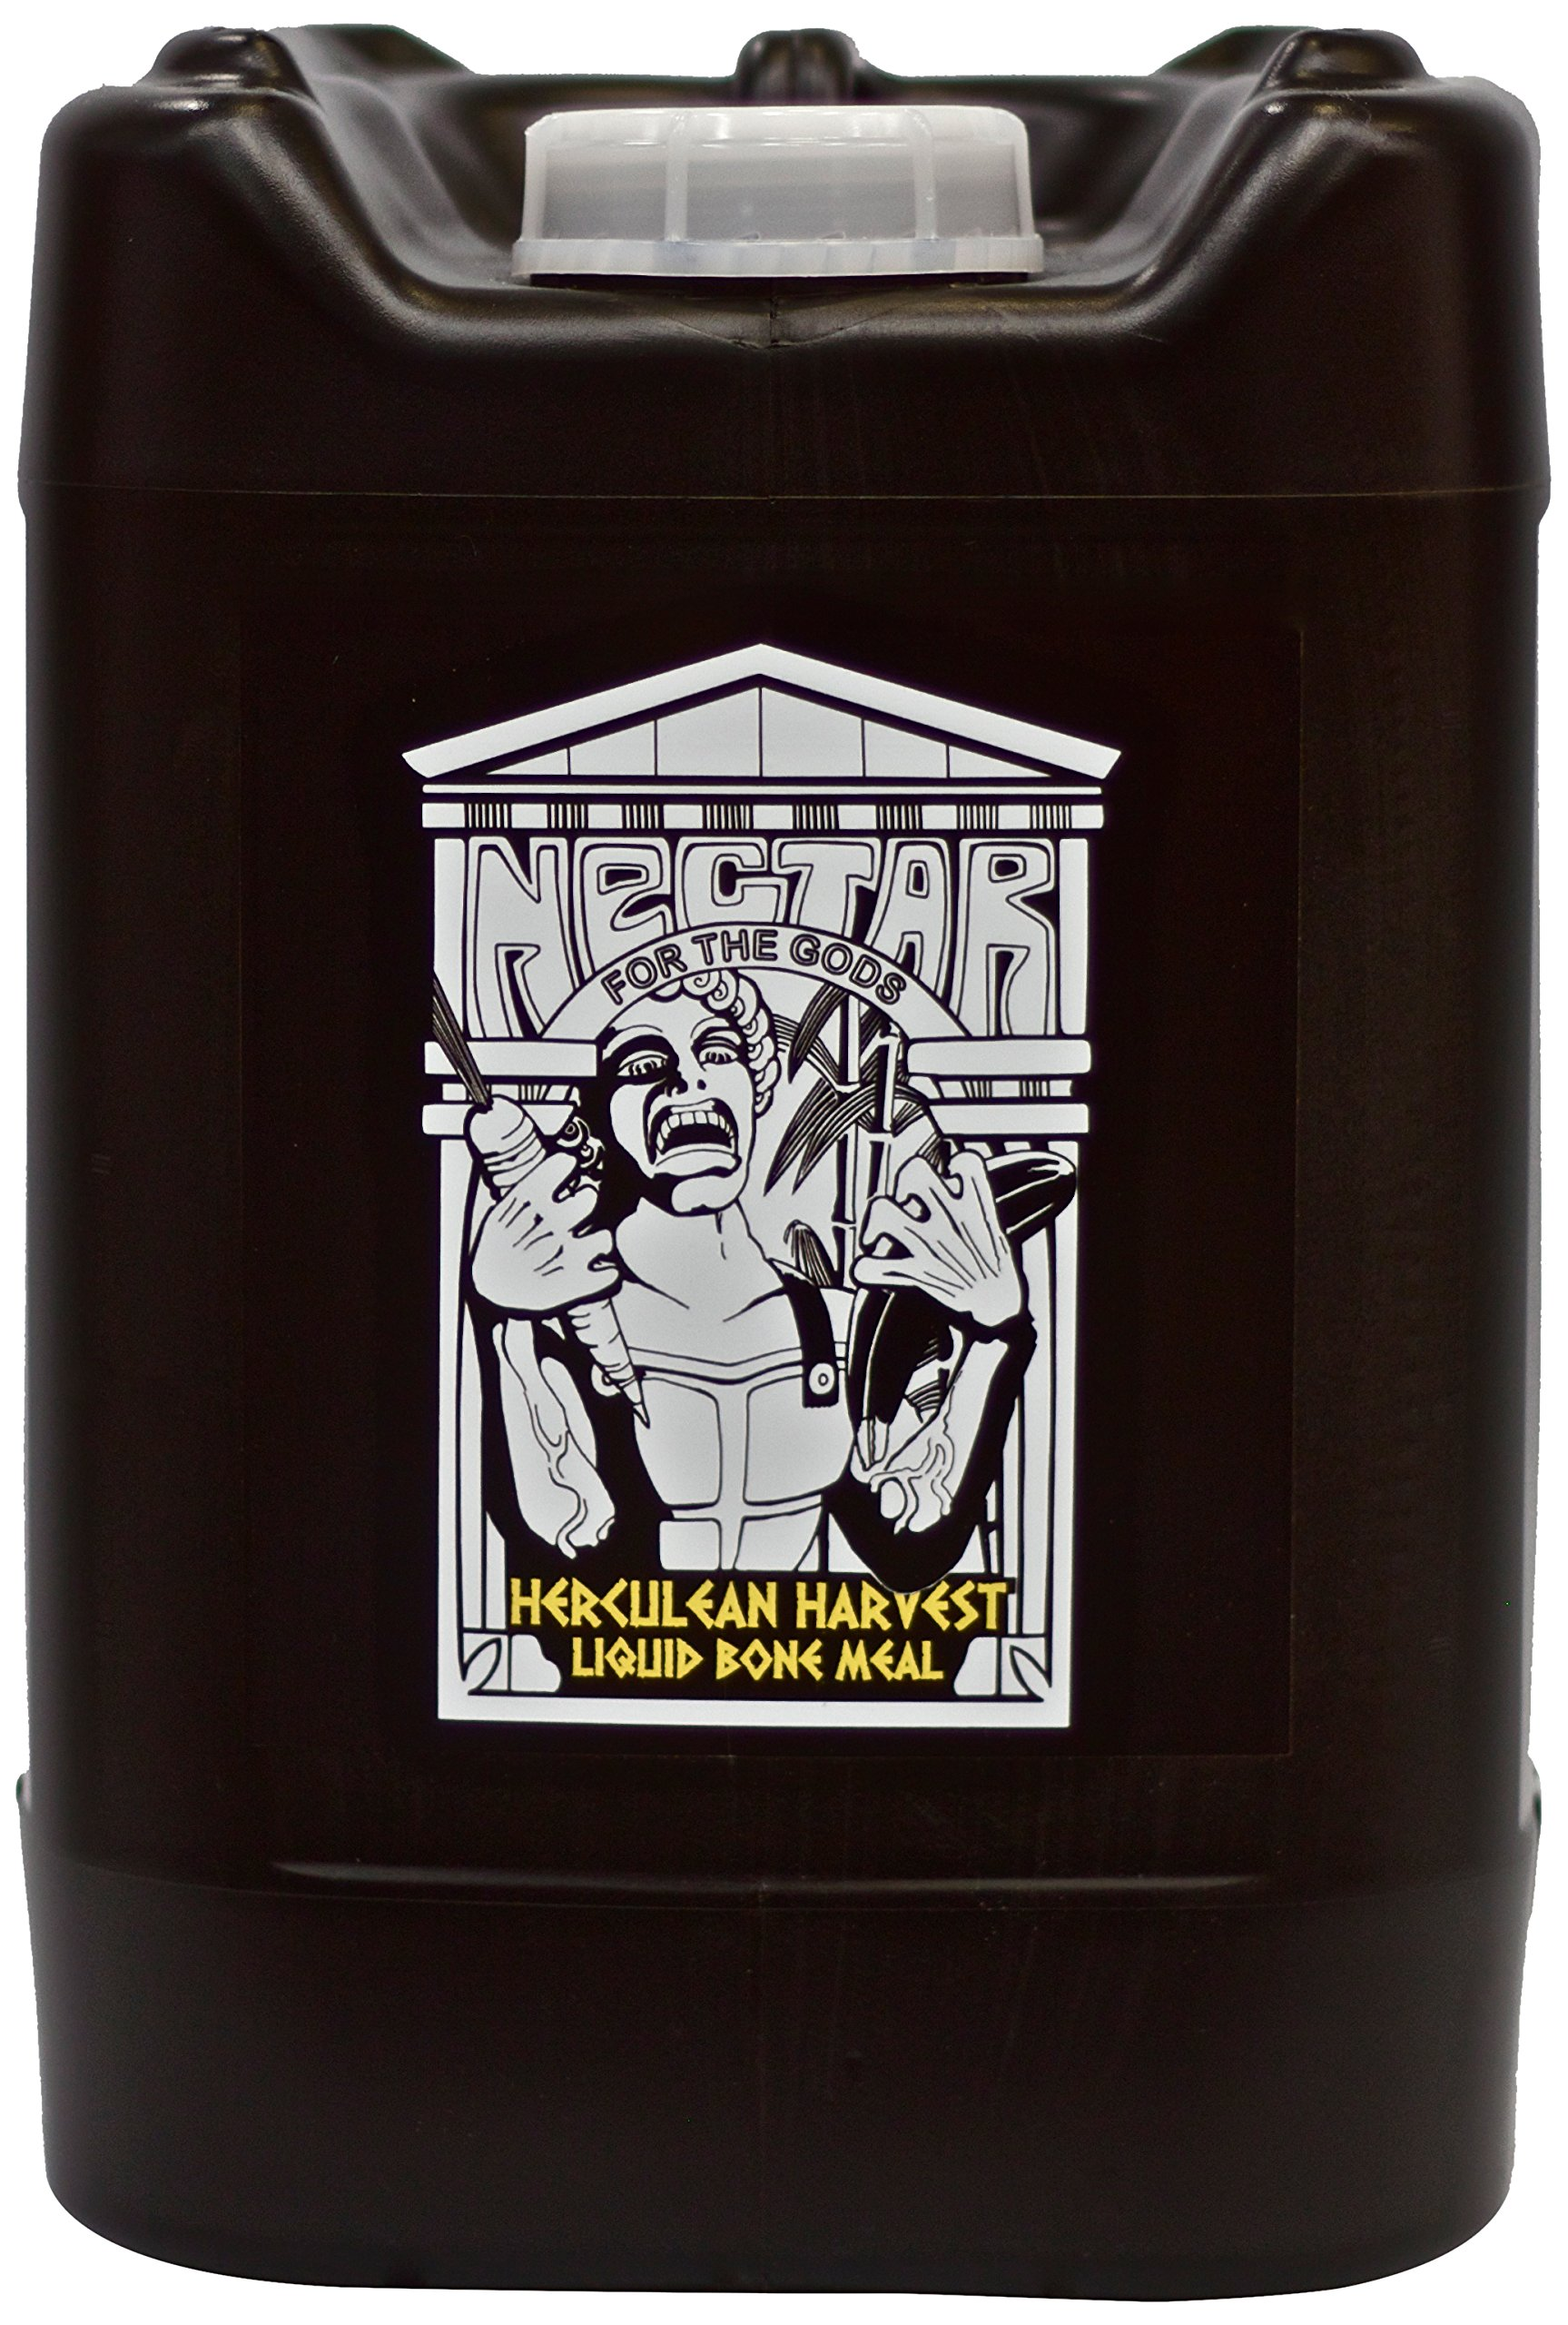 Nectar For The Gods HH5 Herculean Harvest, 5 Gallon